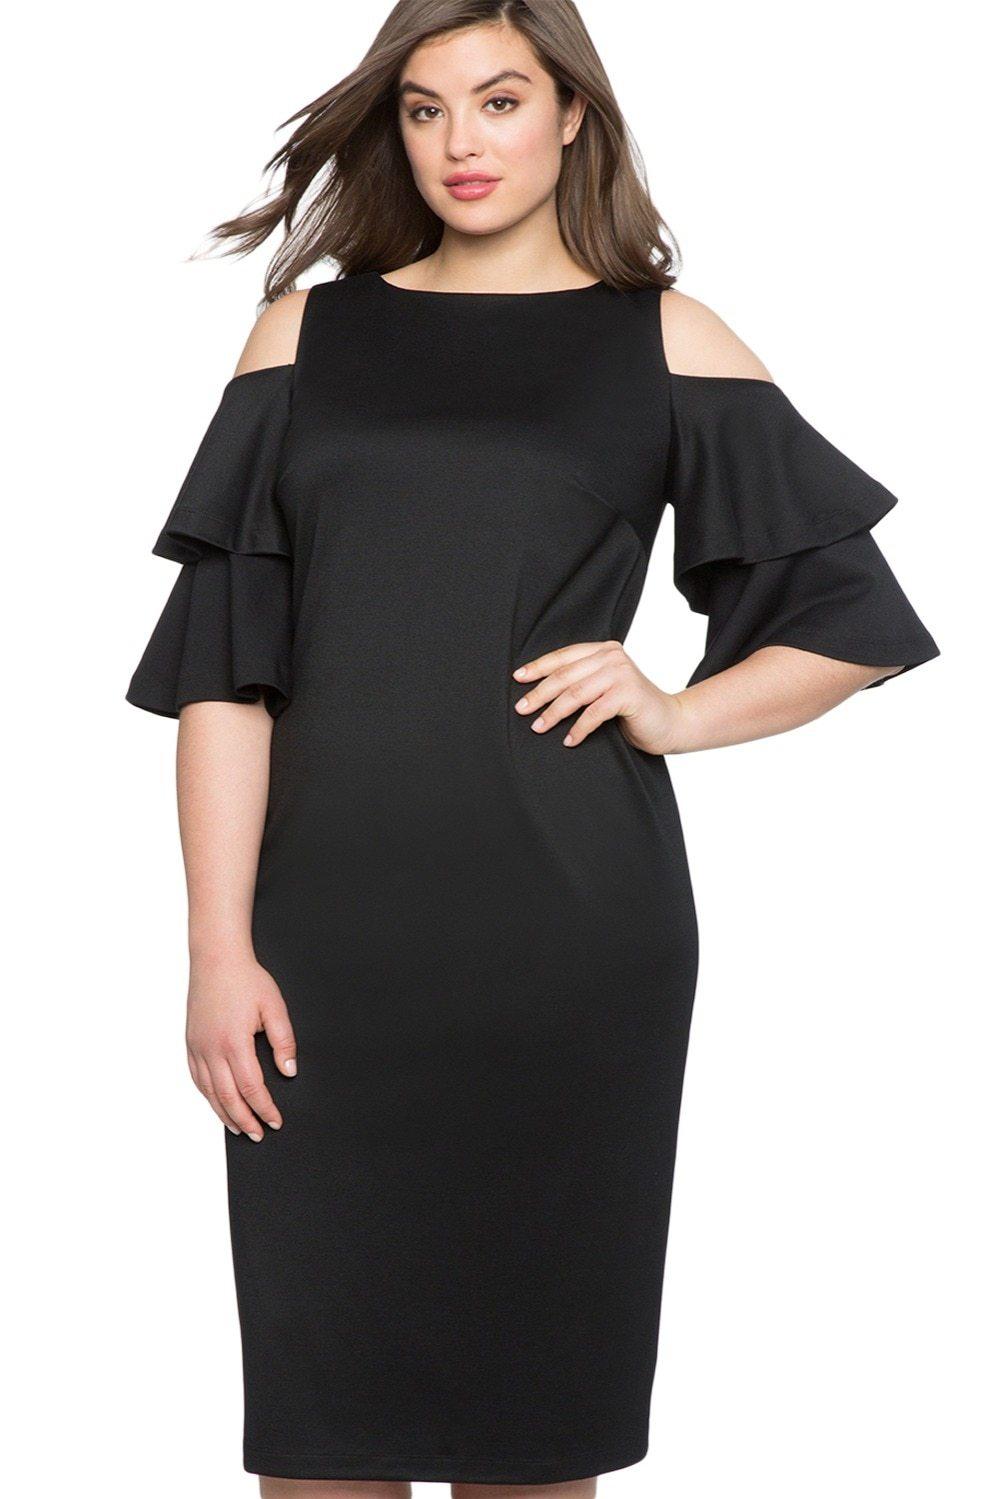 1ebcf0a37cd Plus Size Flounce Half Sleeve Cold Shoulder Midi Dress in 2019 ...